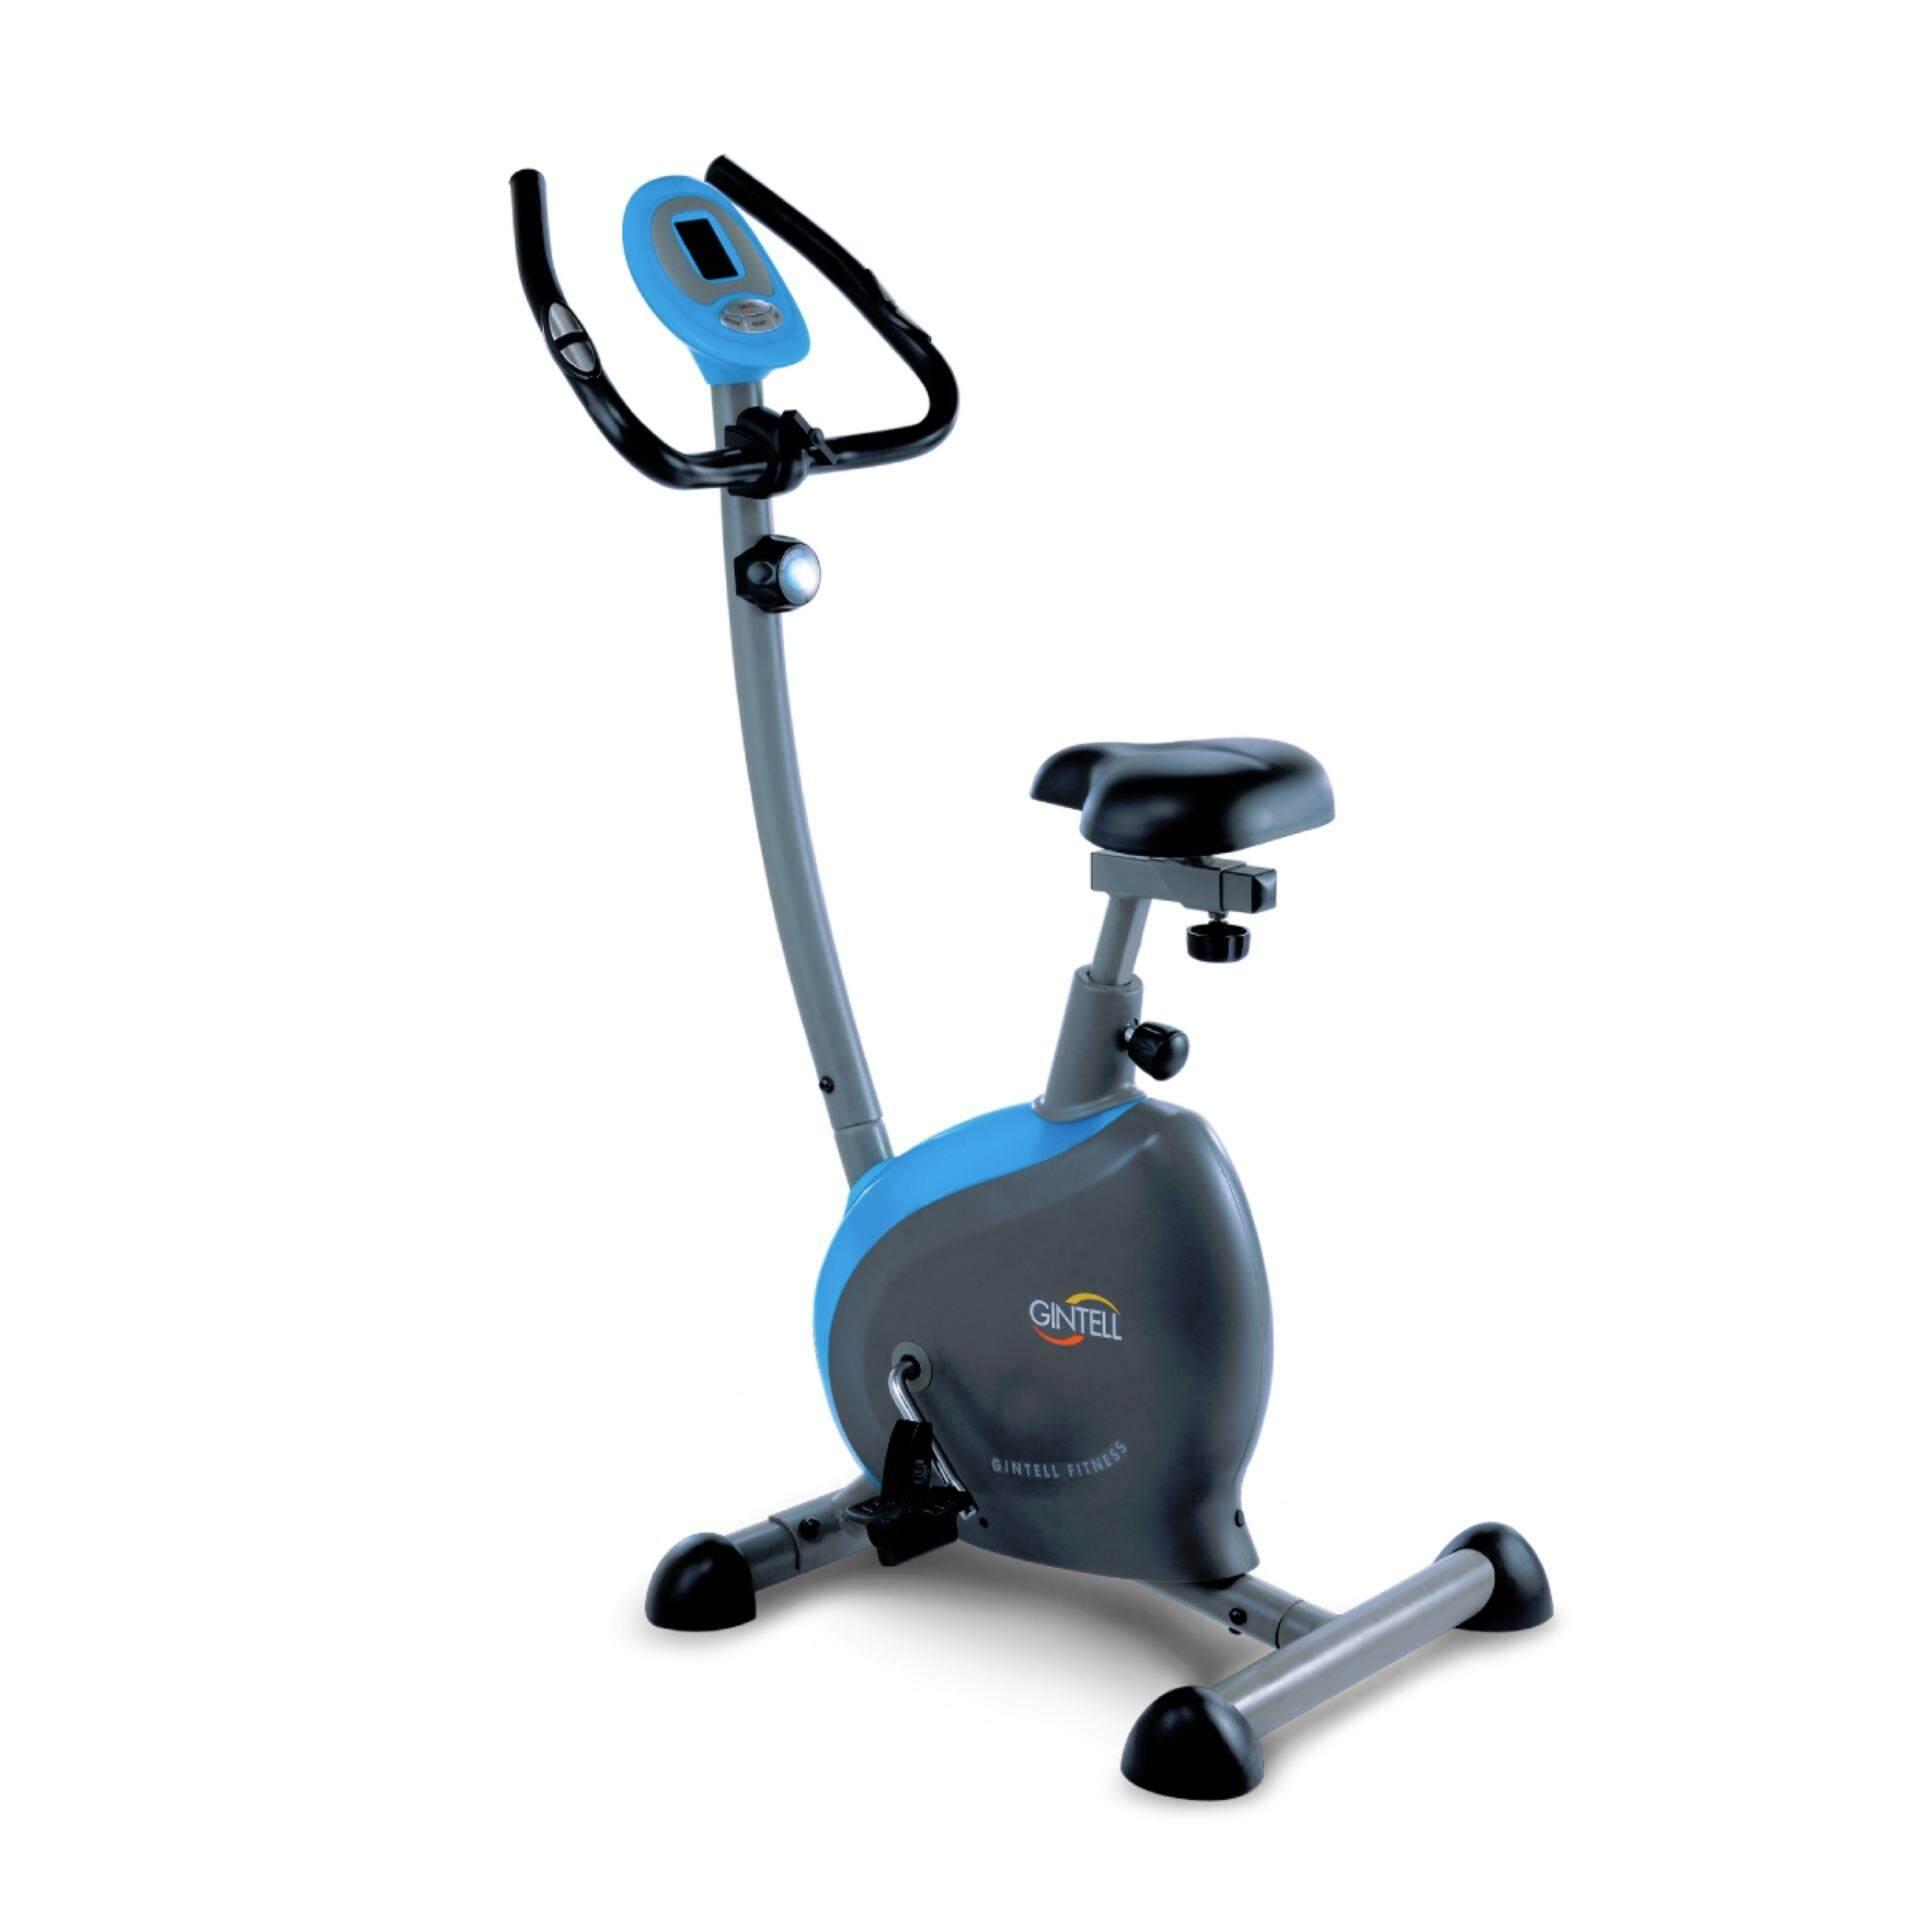 GINTELL Magnetic Bike FT234